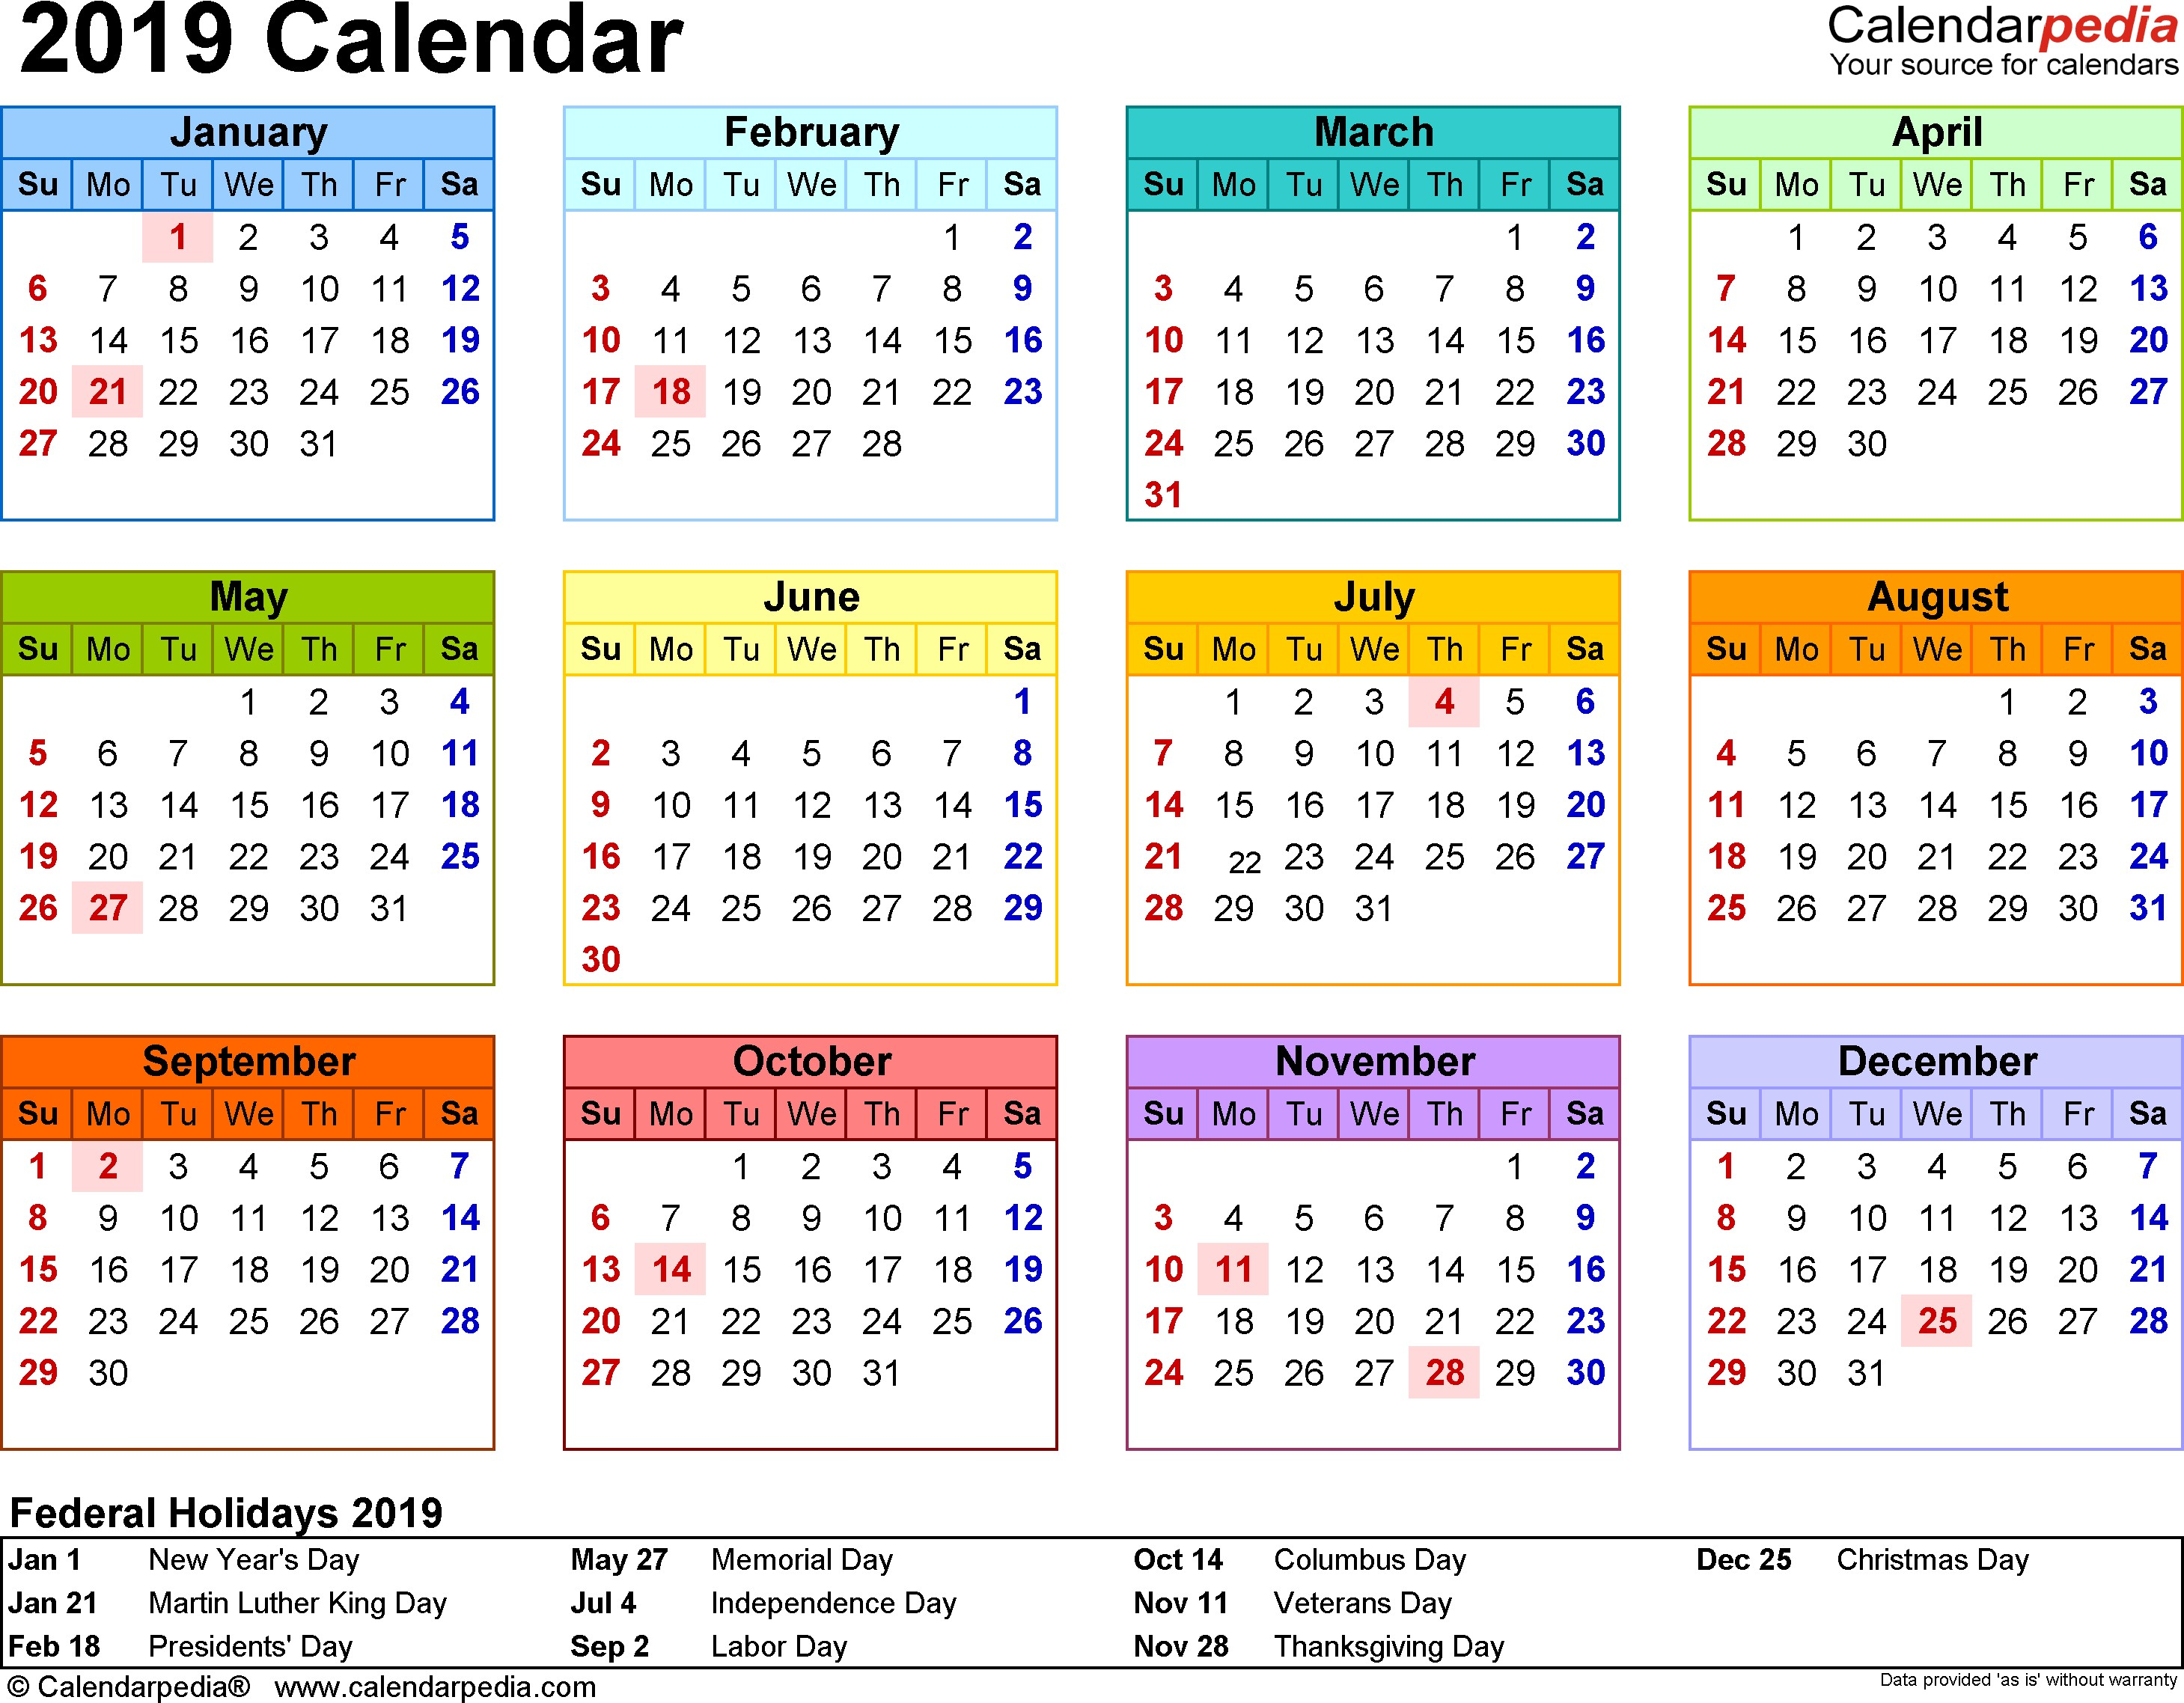 2019 Calendar Printable Microsoft Word 2019 Calendar 17 Free Printable Word Calendar Templates